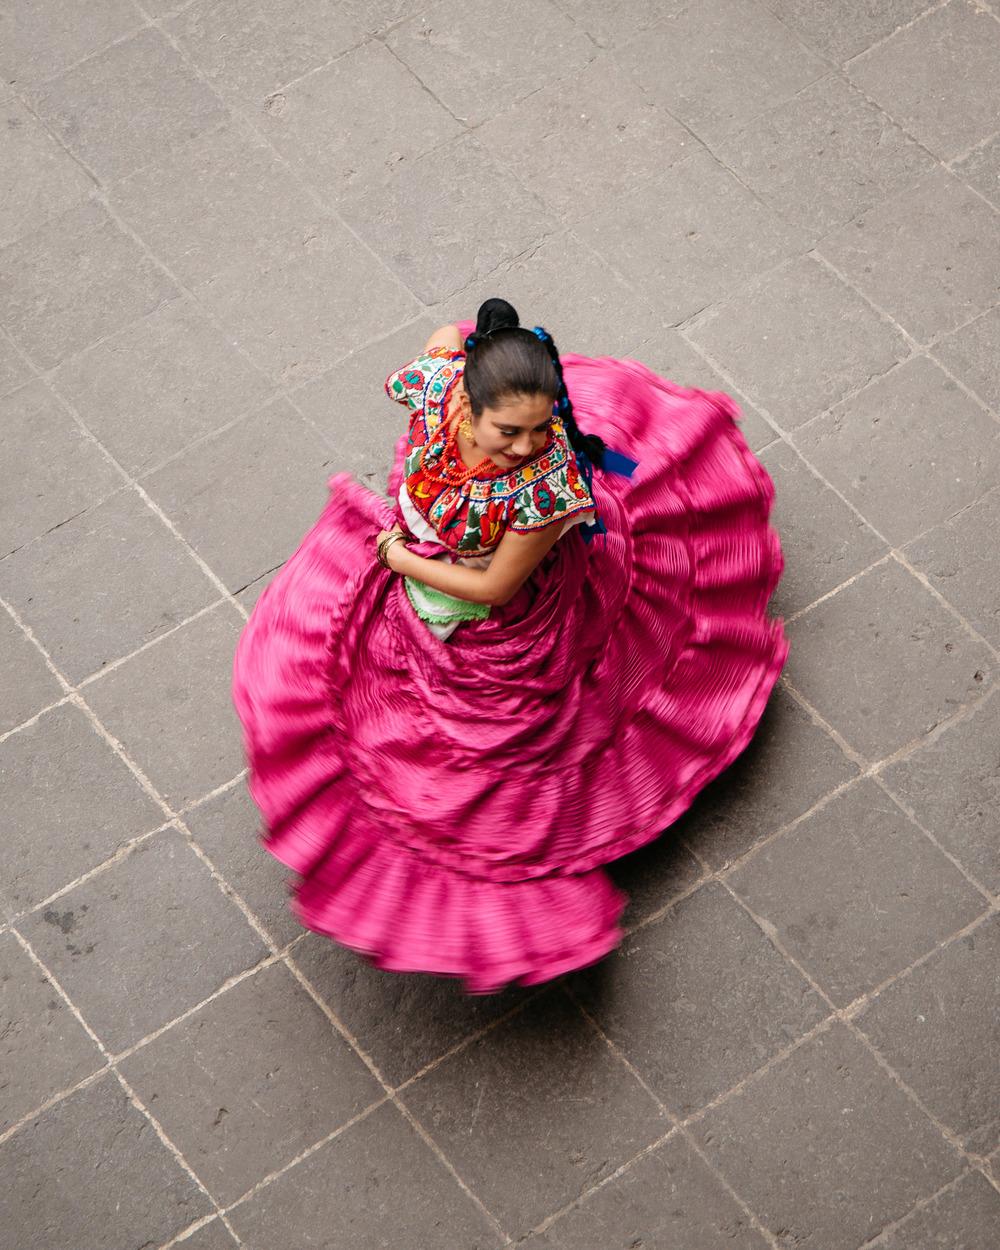 Mexico_2015-18.jpg